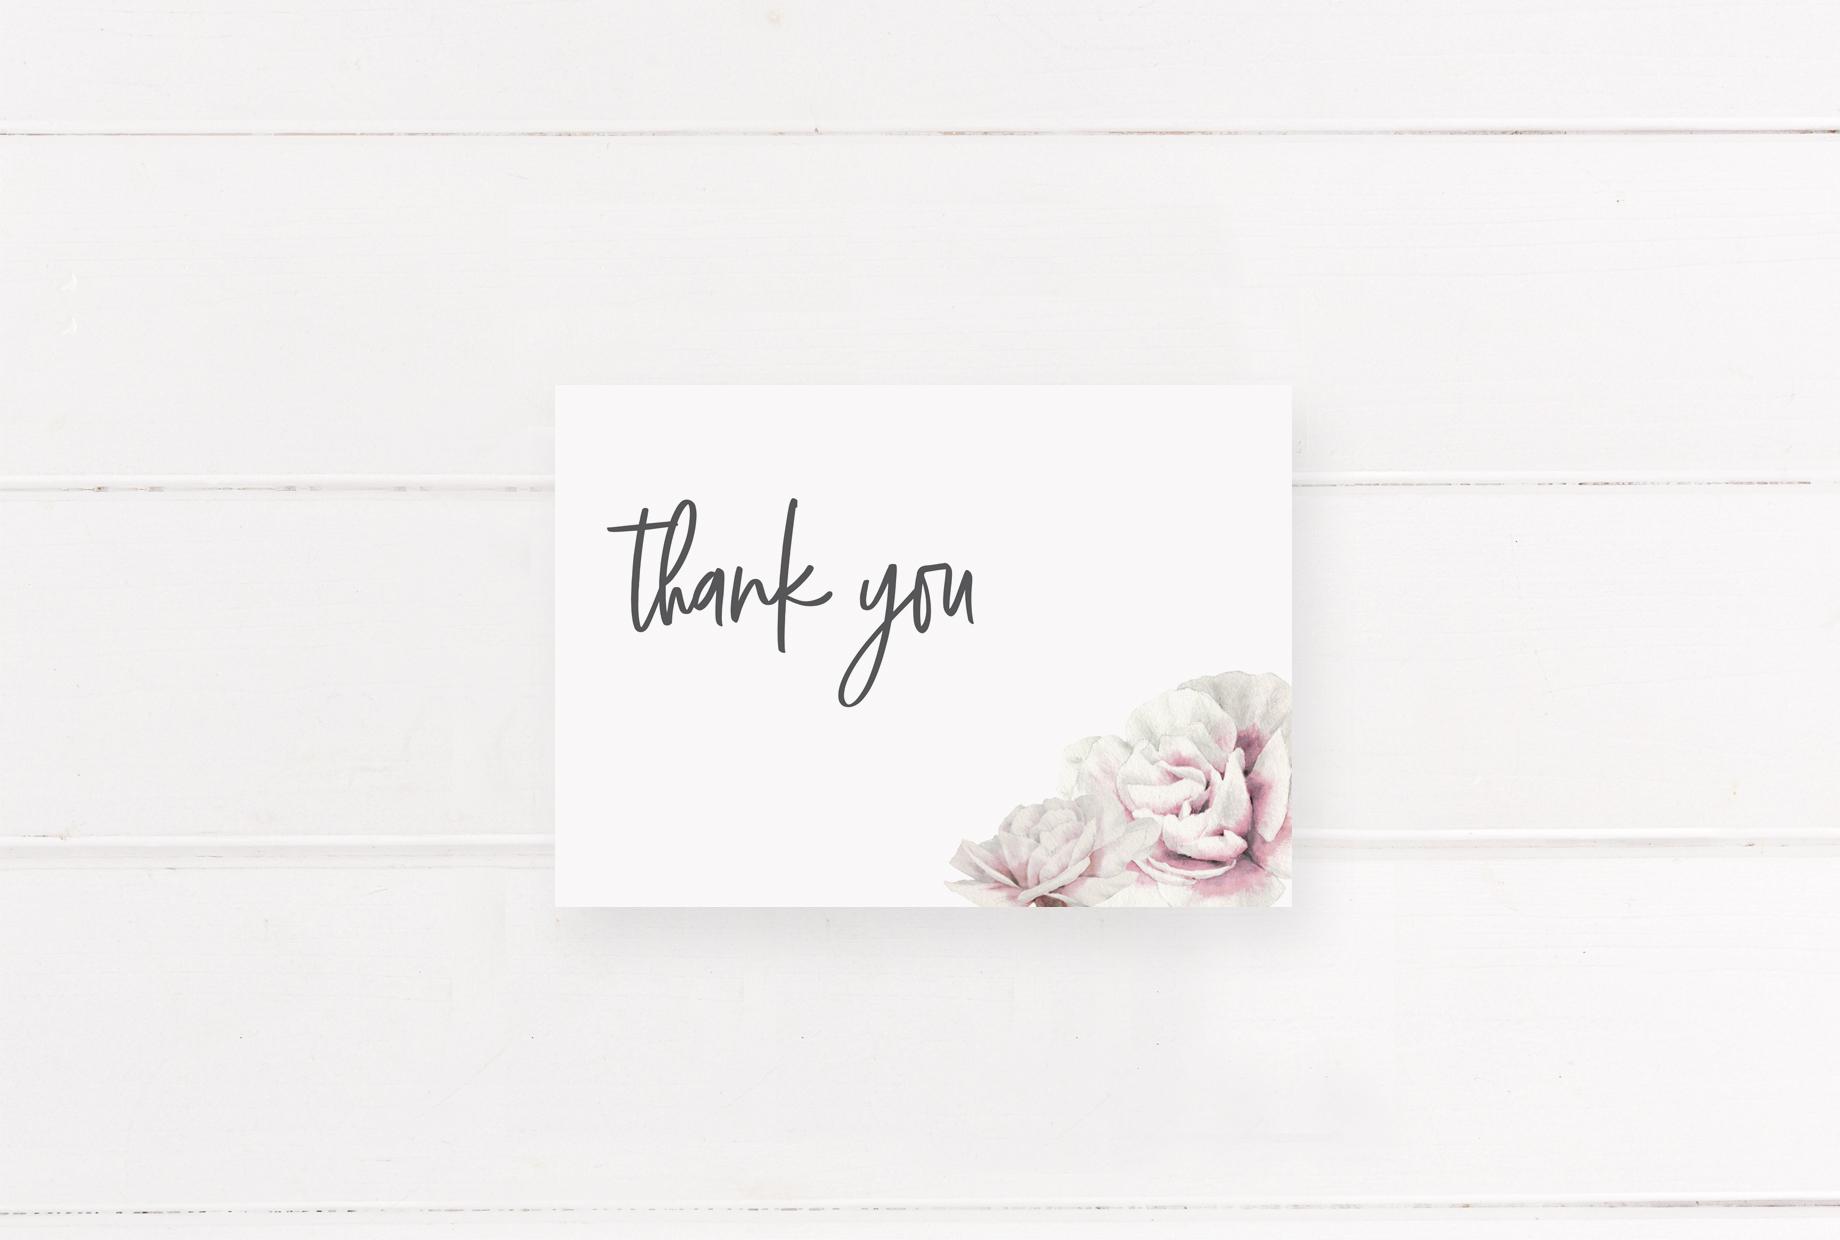 botanic thank you card.jpg